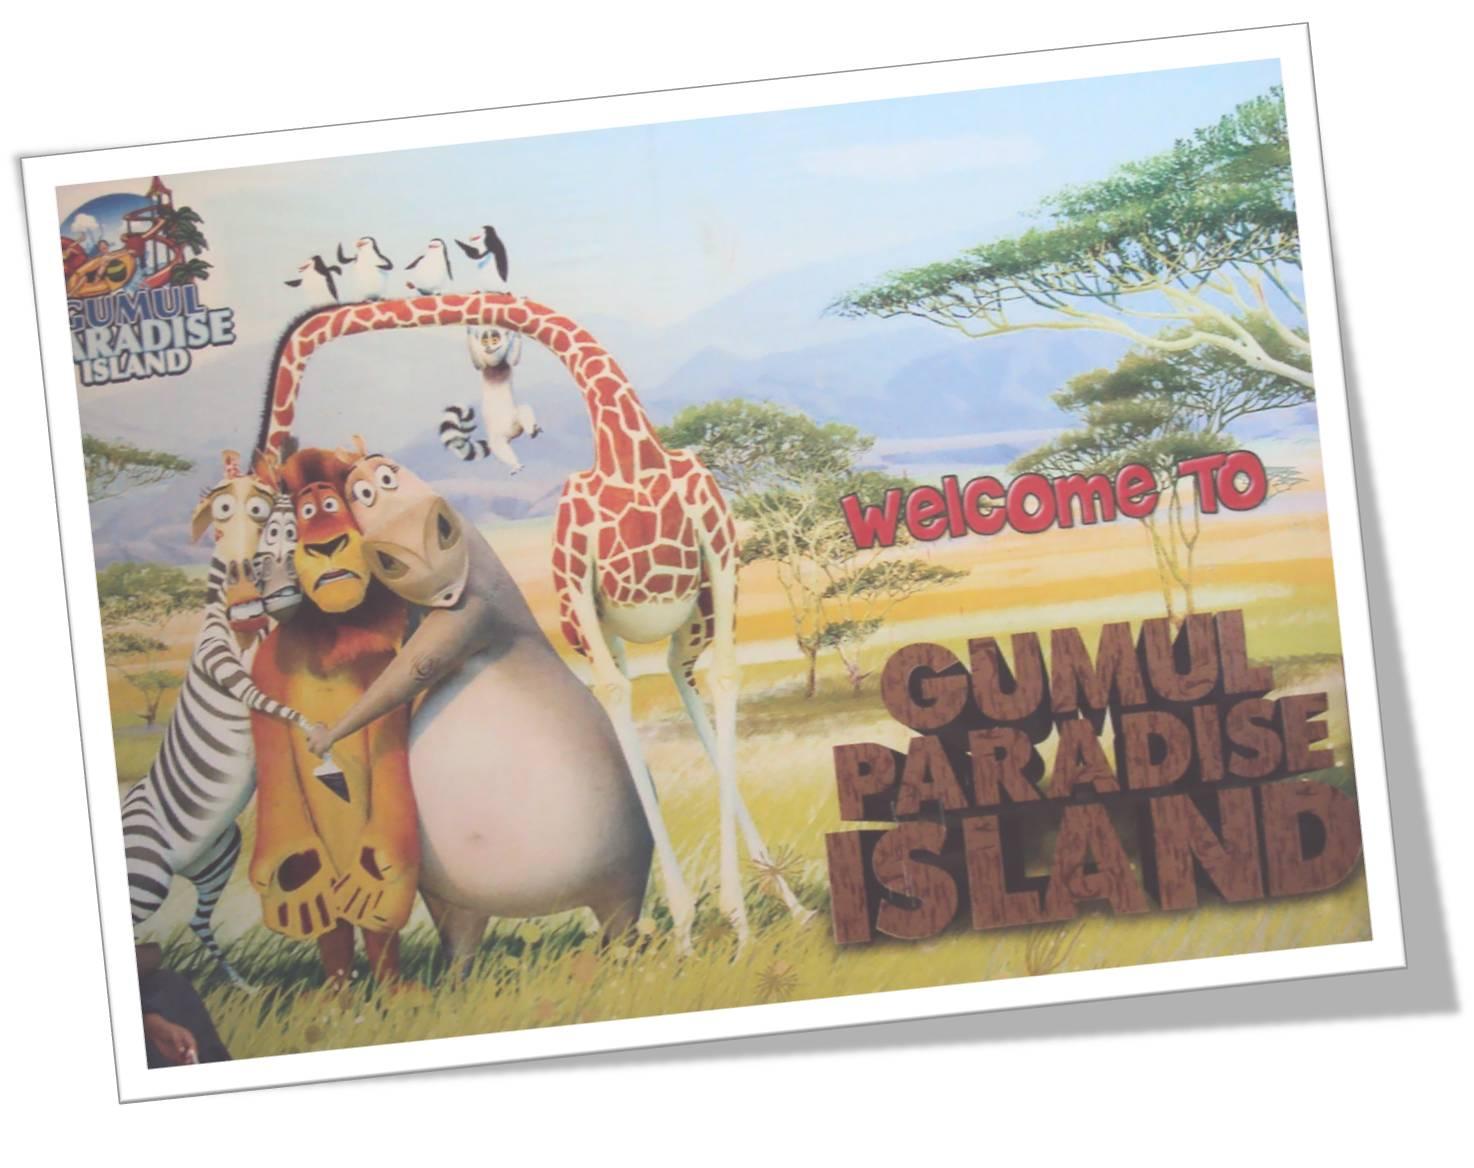 Water Boom Gumul Paradise Island Kediri World Kab